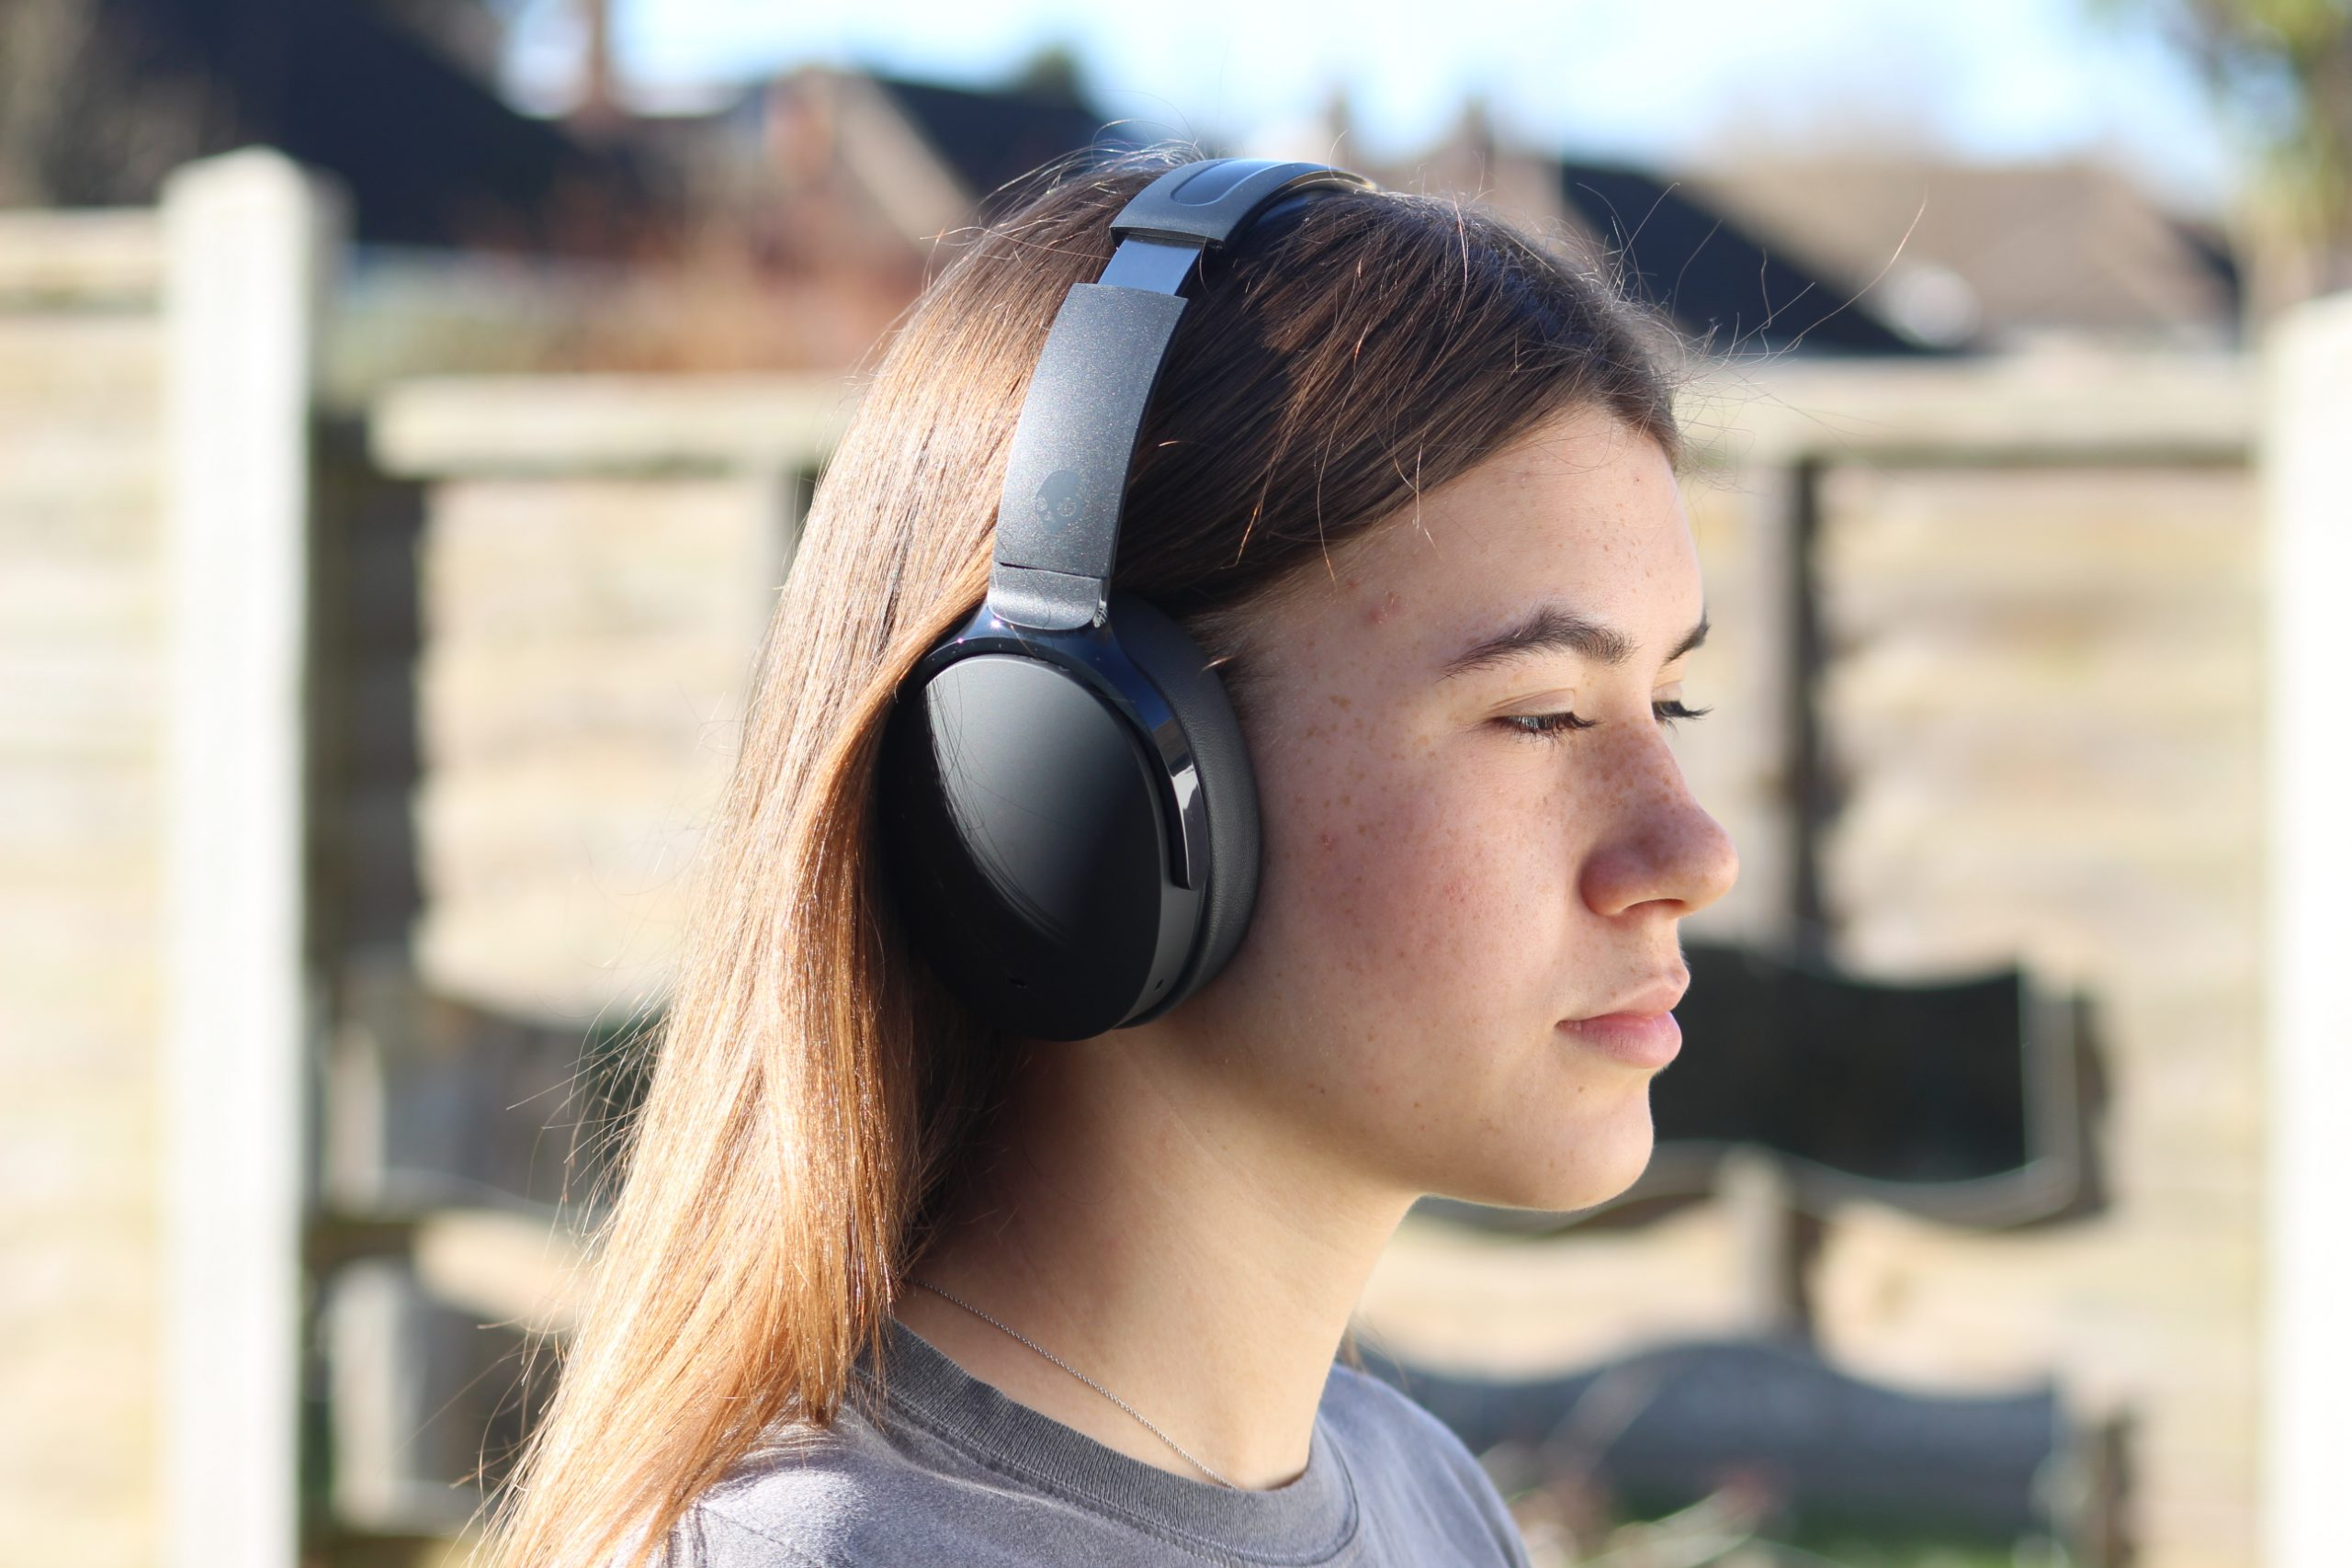 https://www.rtings.com/headphones/reviews/skullcandy/hesh-anc-wireless